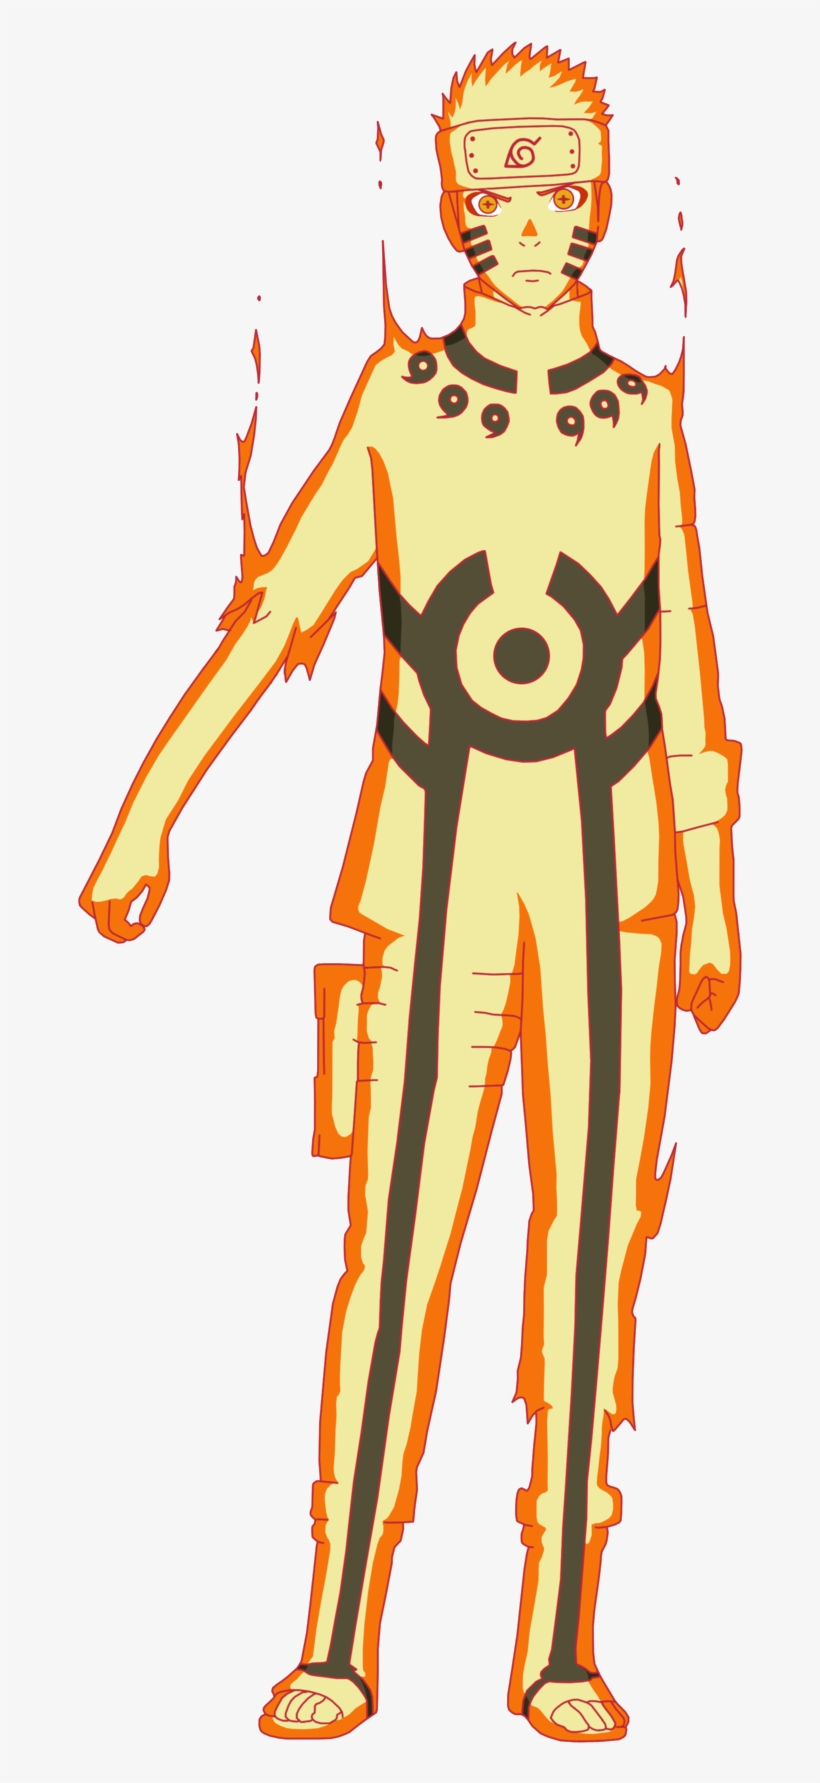 Naruto Uzumaki Naruto Nine-Tails Bijuu Mode costume